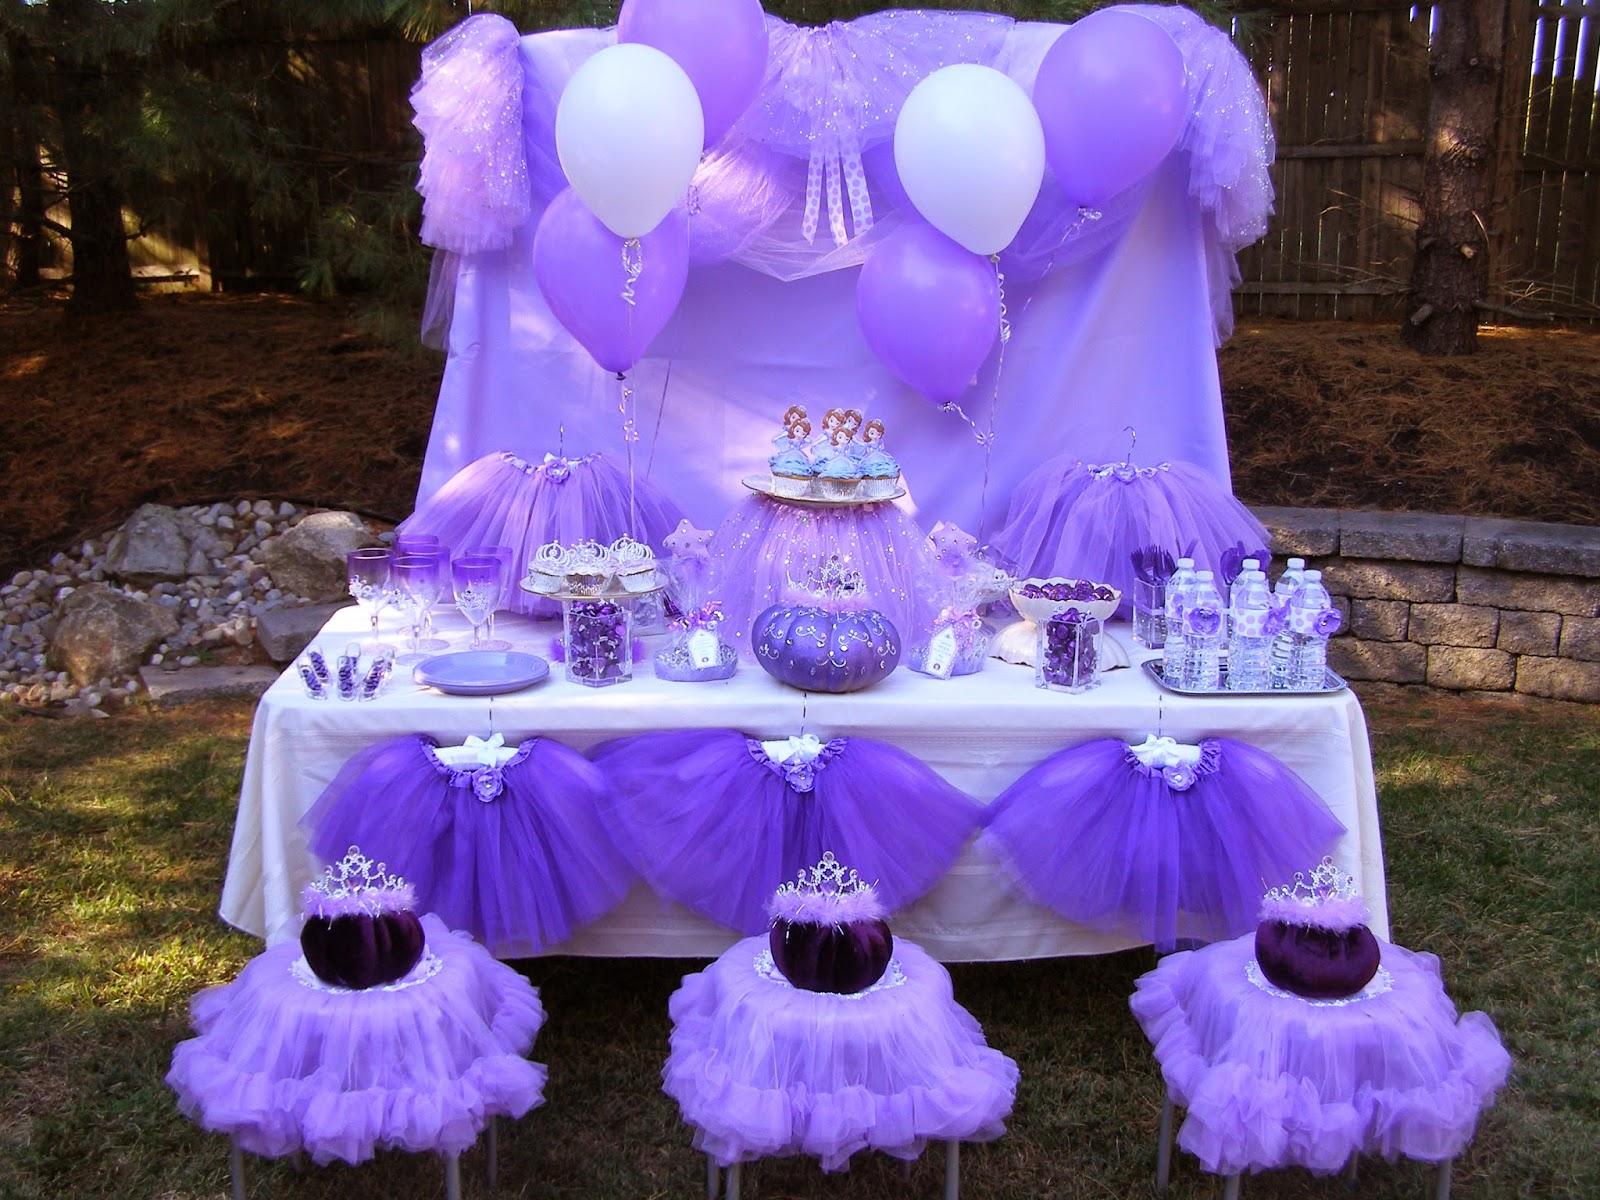 The Princess Birthday Blog: October 2014